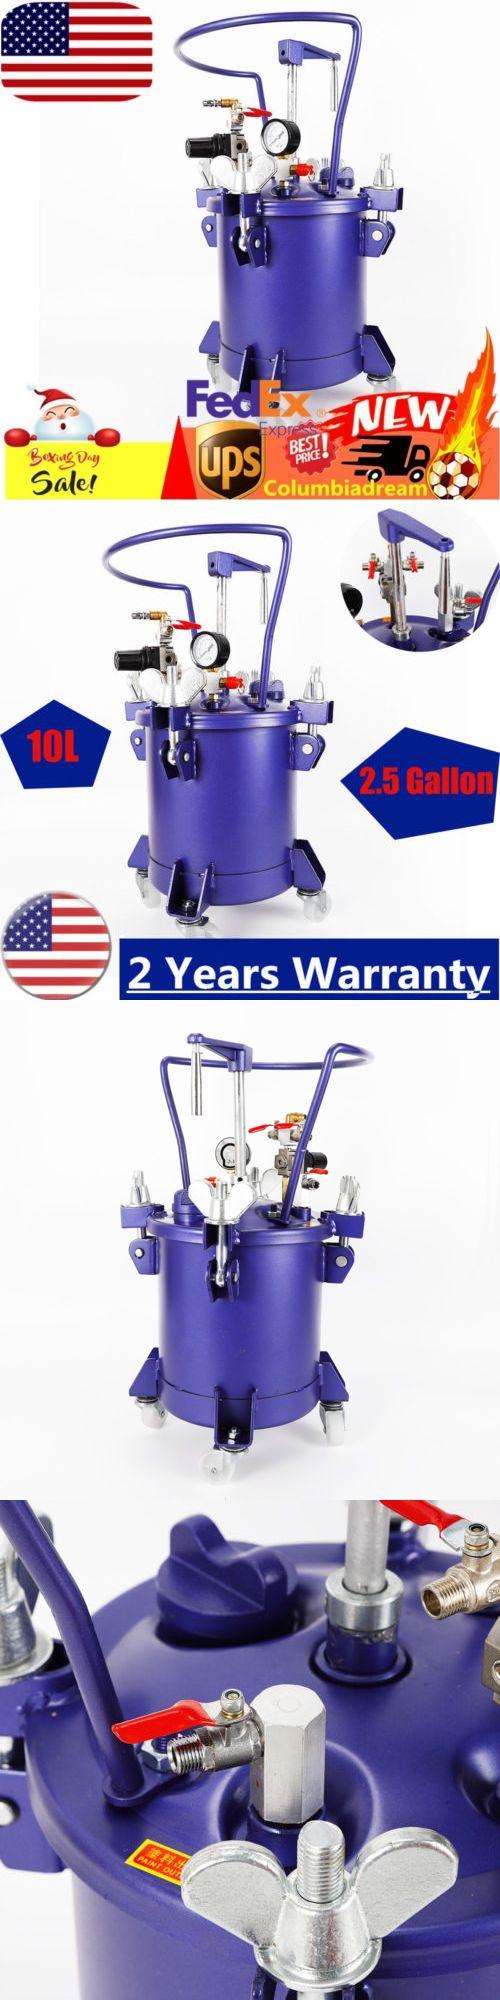 Paint Sprayers 79702: 10 Gallon Pressure Paint Pot Tank Spray Gun